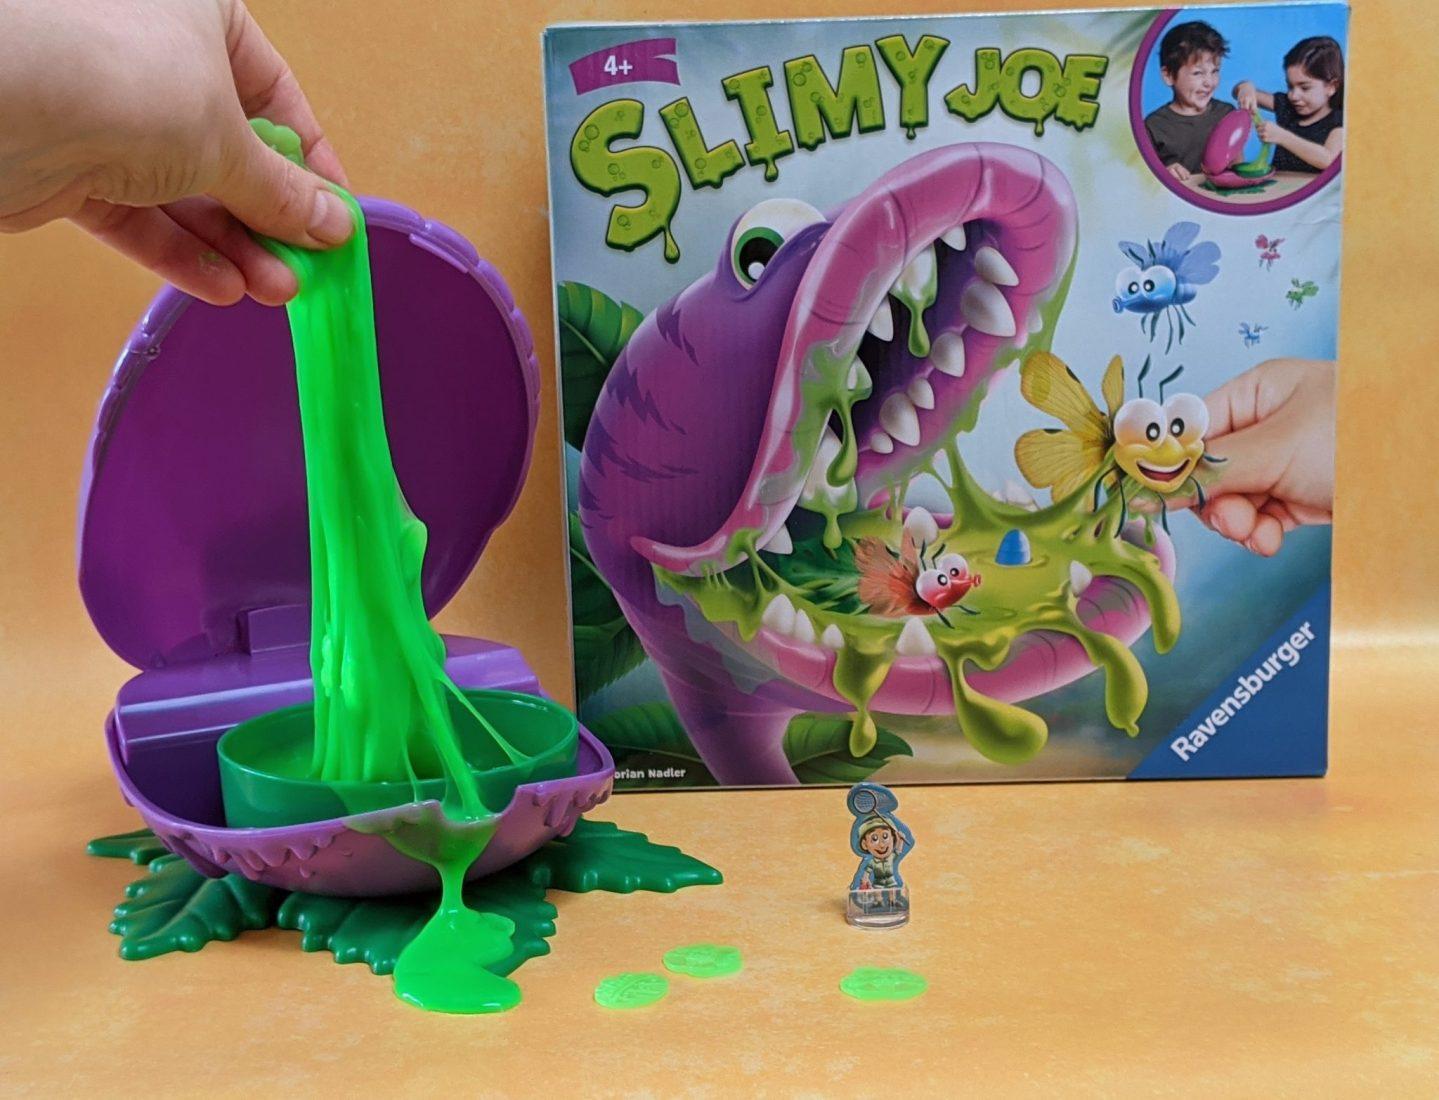 Slimy Joe review